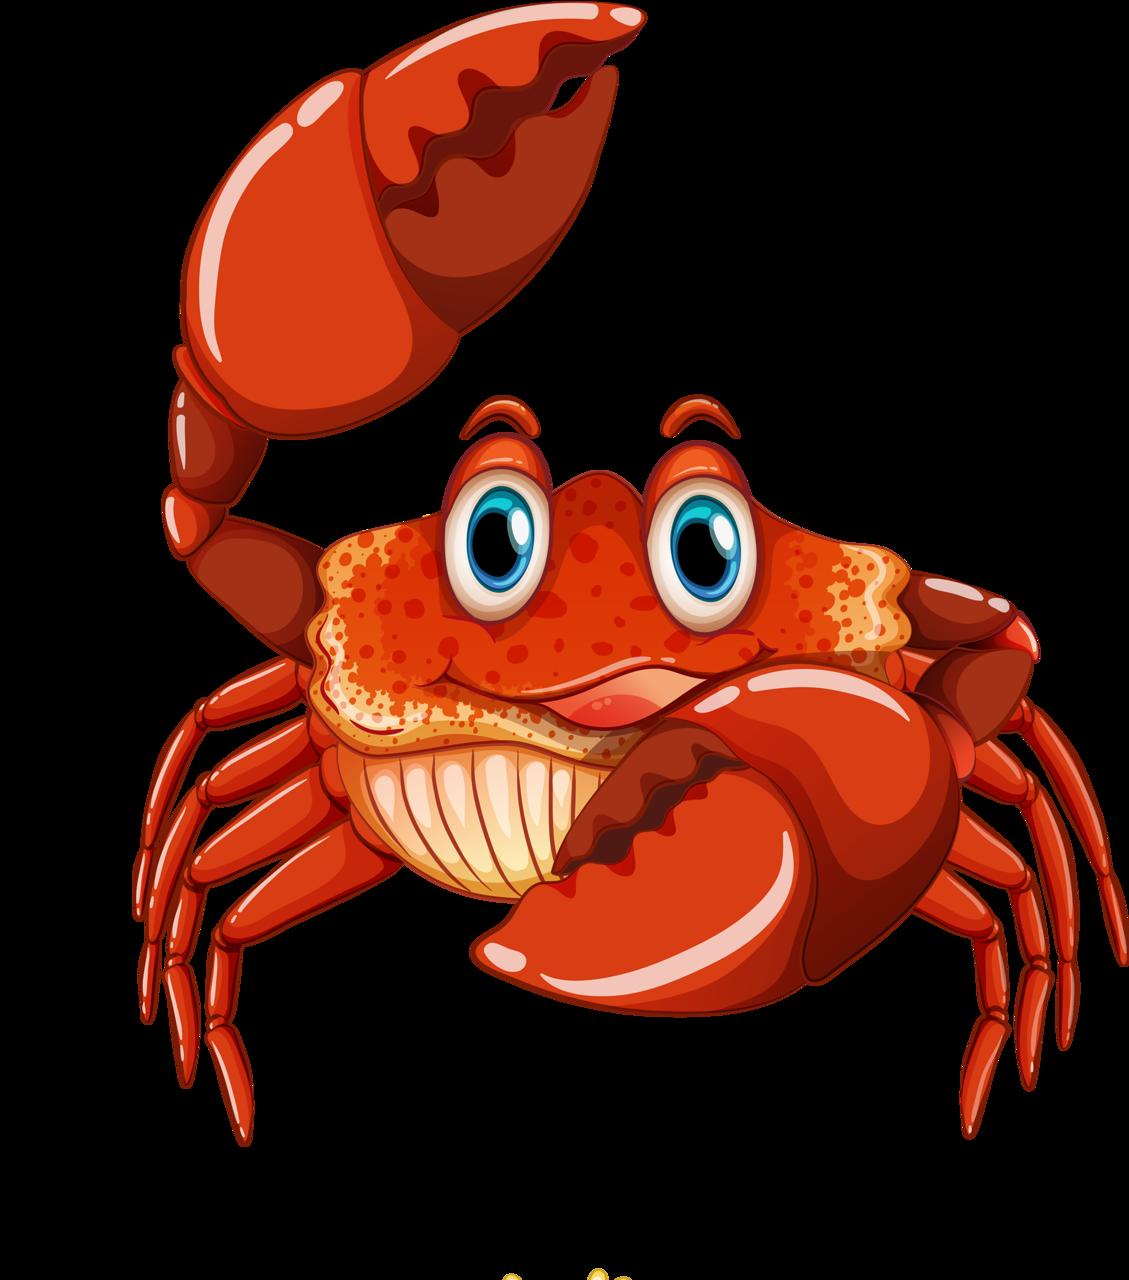 Яндекс.Фотки Clipart fish and sea Pinterest Clip art